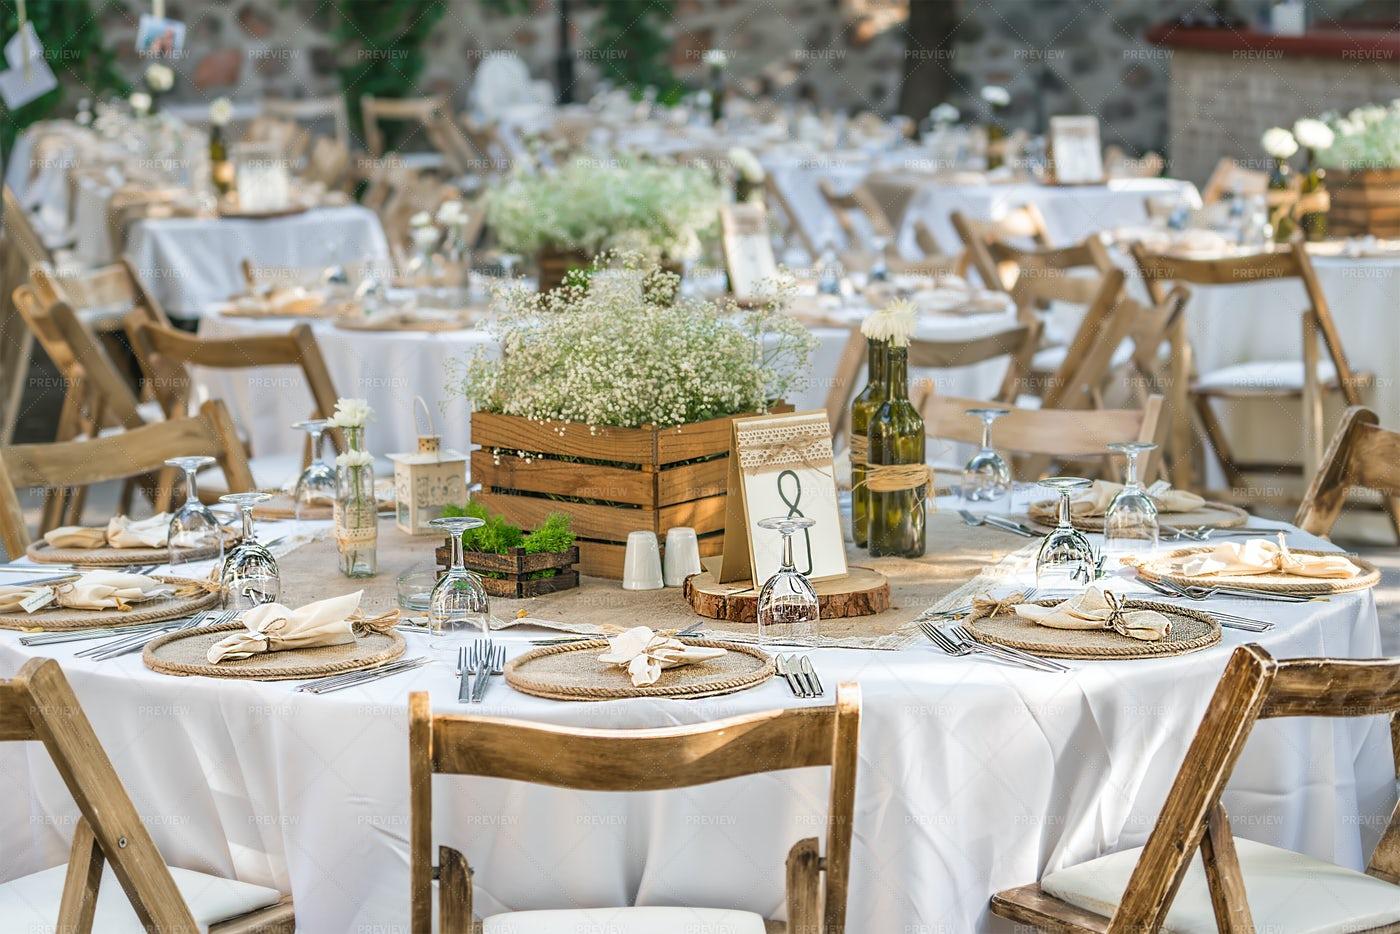 Many Laid Wedding Tables: Stock Photos